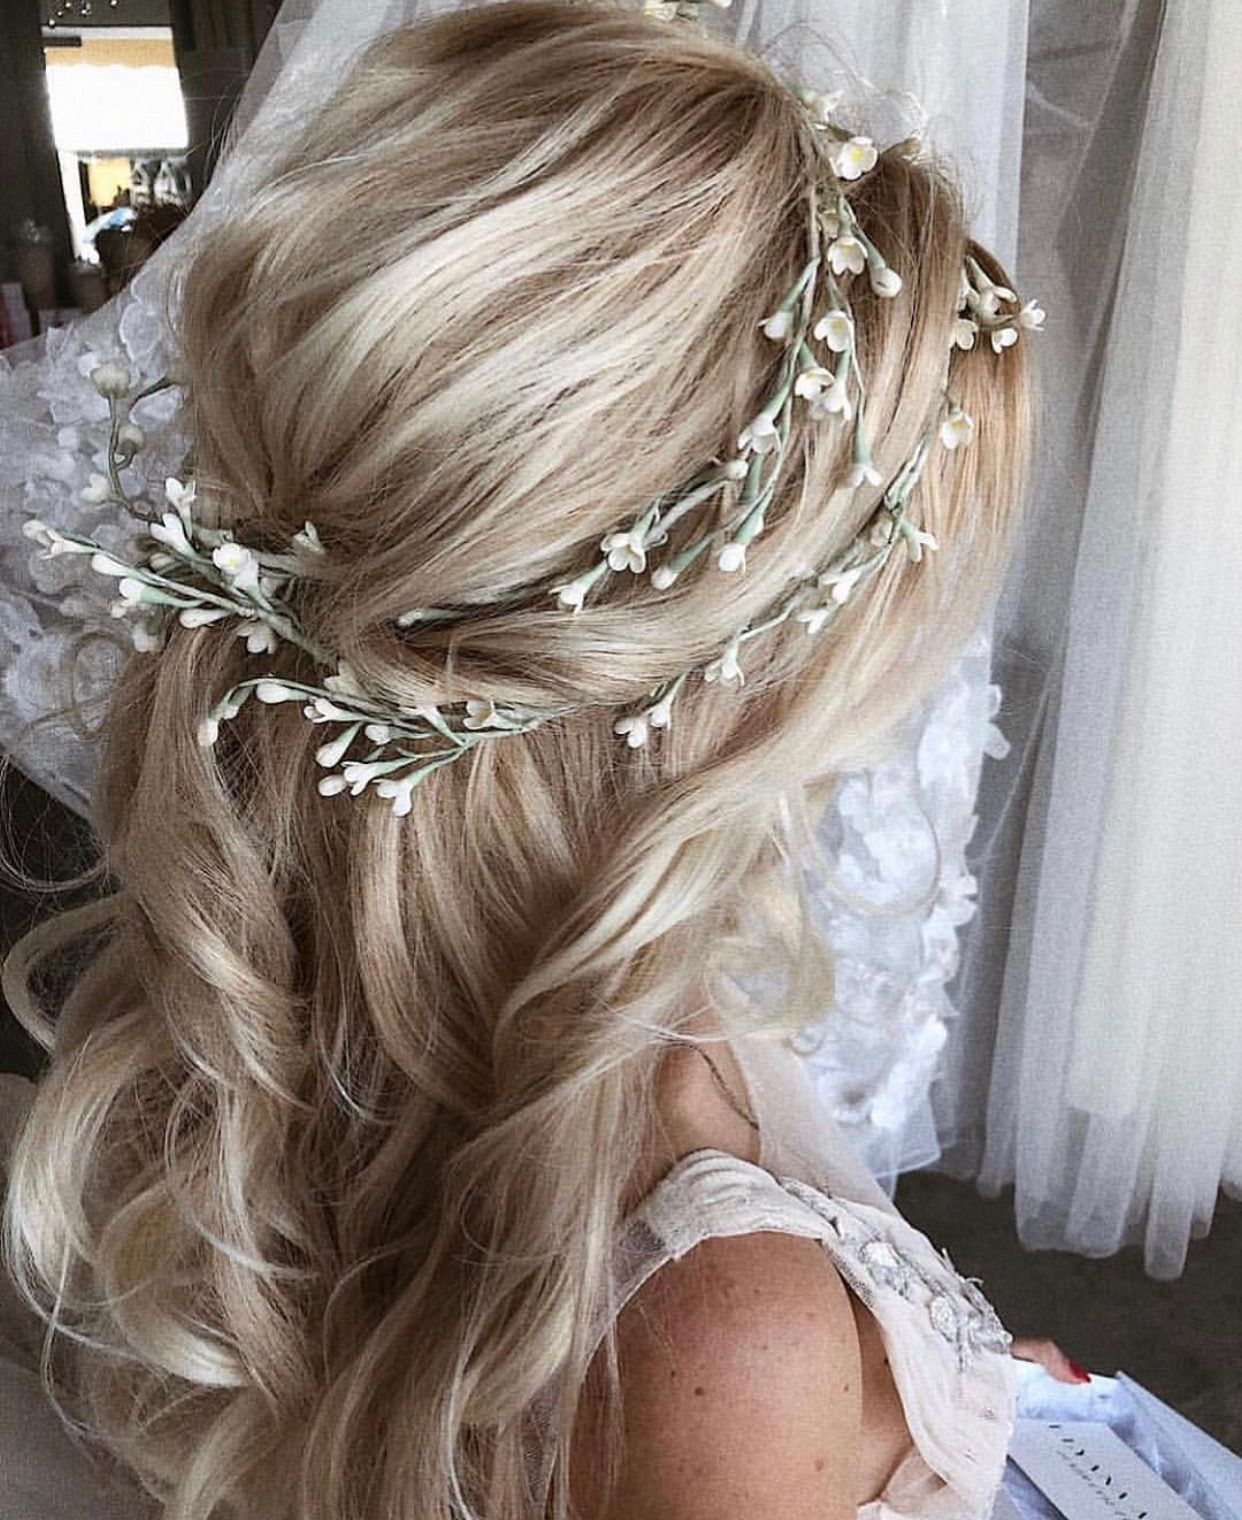 pinterest: @pawank90 | makeup and hair in 2019 | wedding